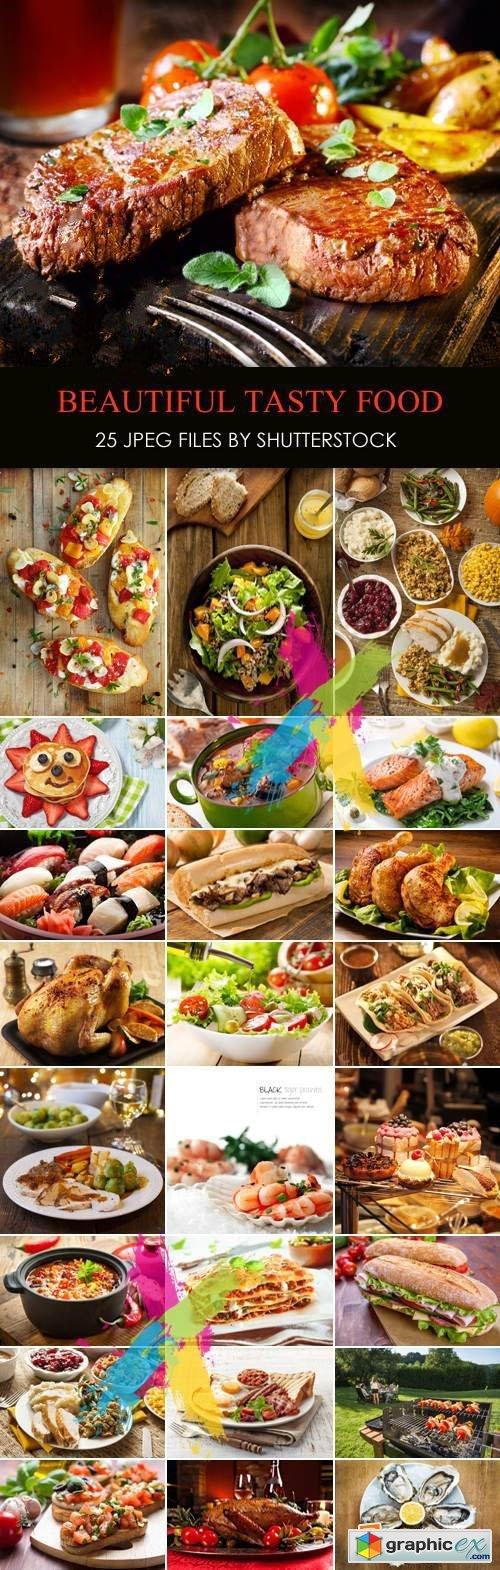 Stock Photo - Beautiful Tasty Food